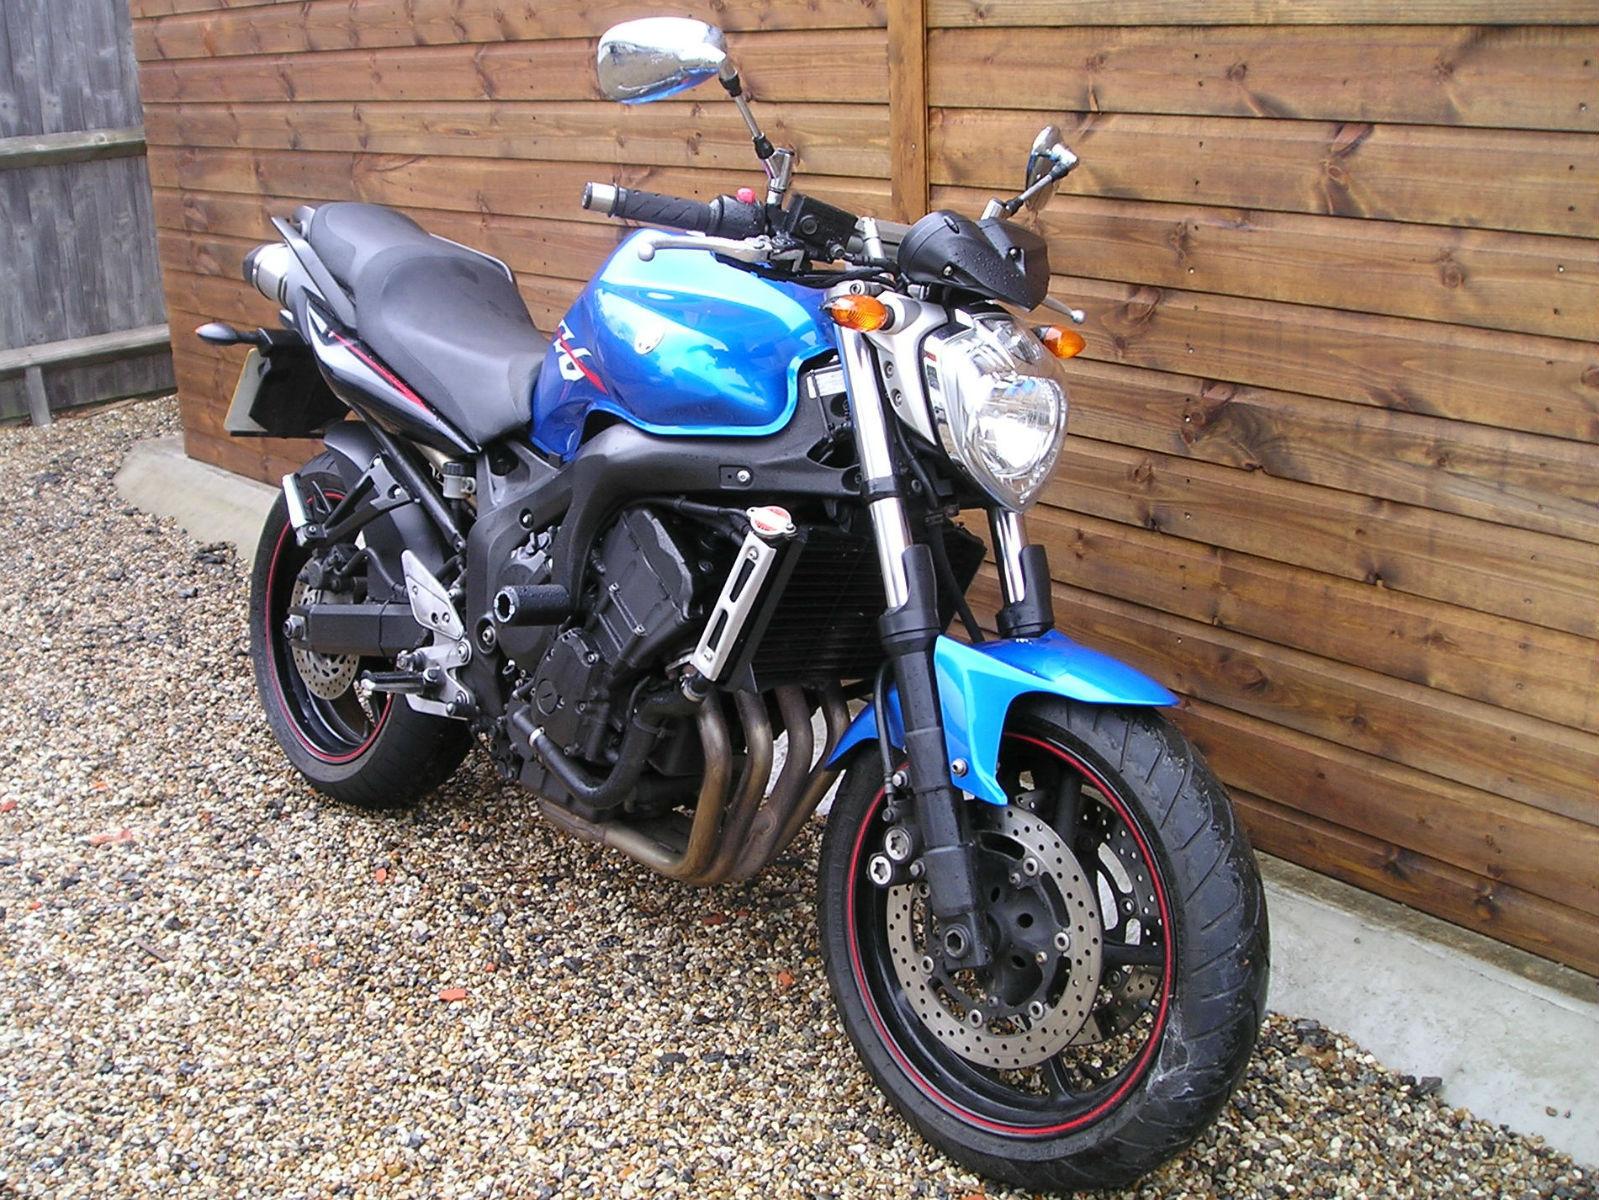 Yamaha FZ6 Naked 600cc   in Emsworth, Hampshire   Gumtree